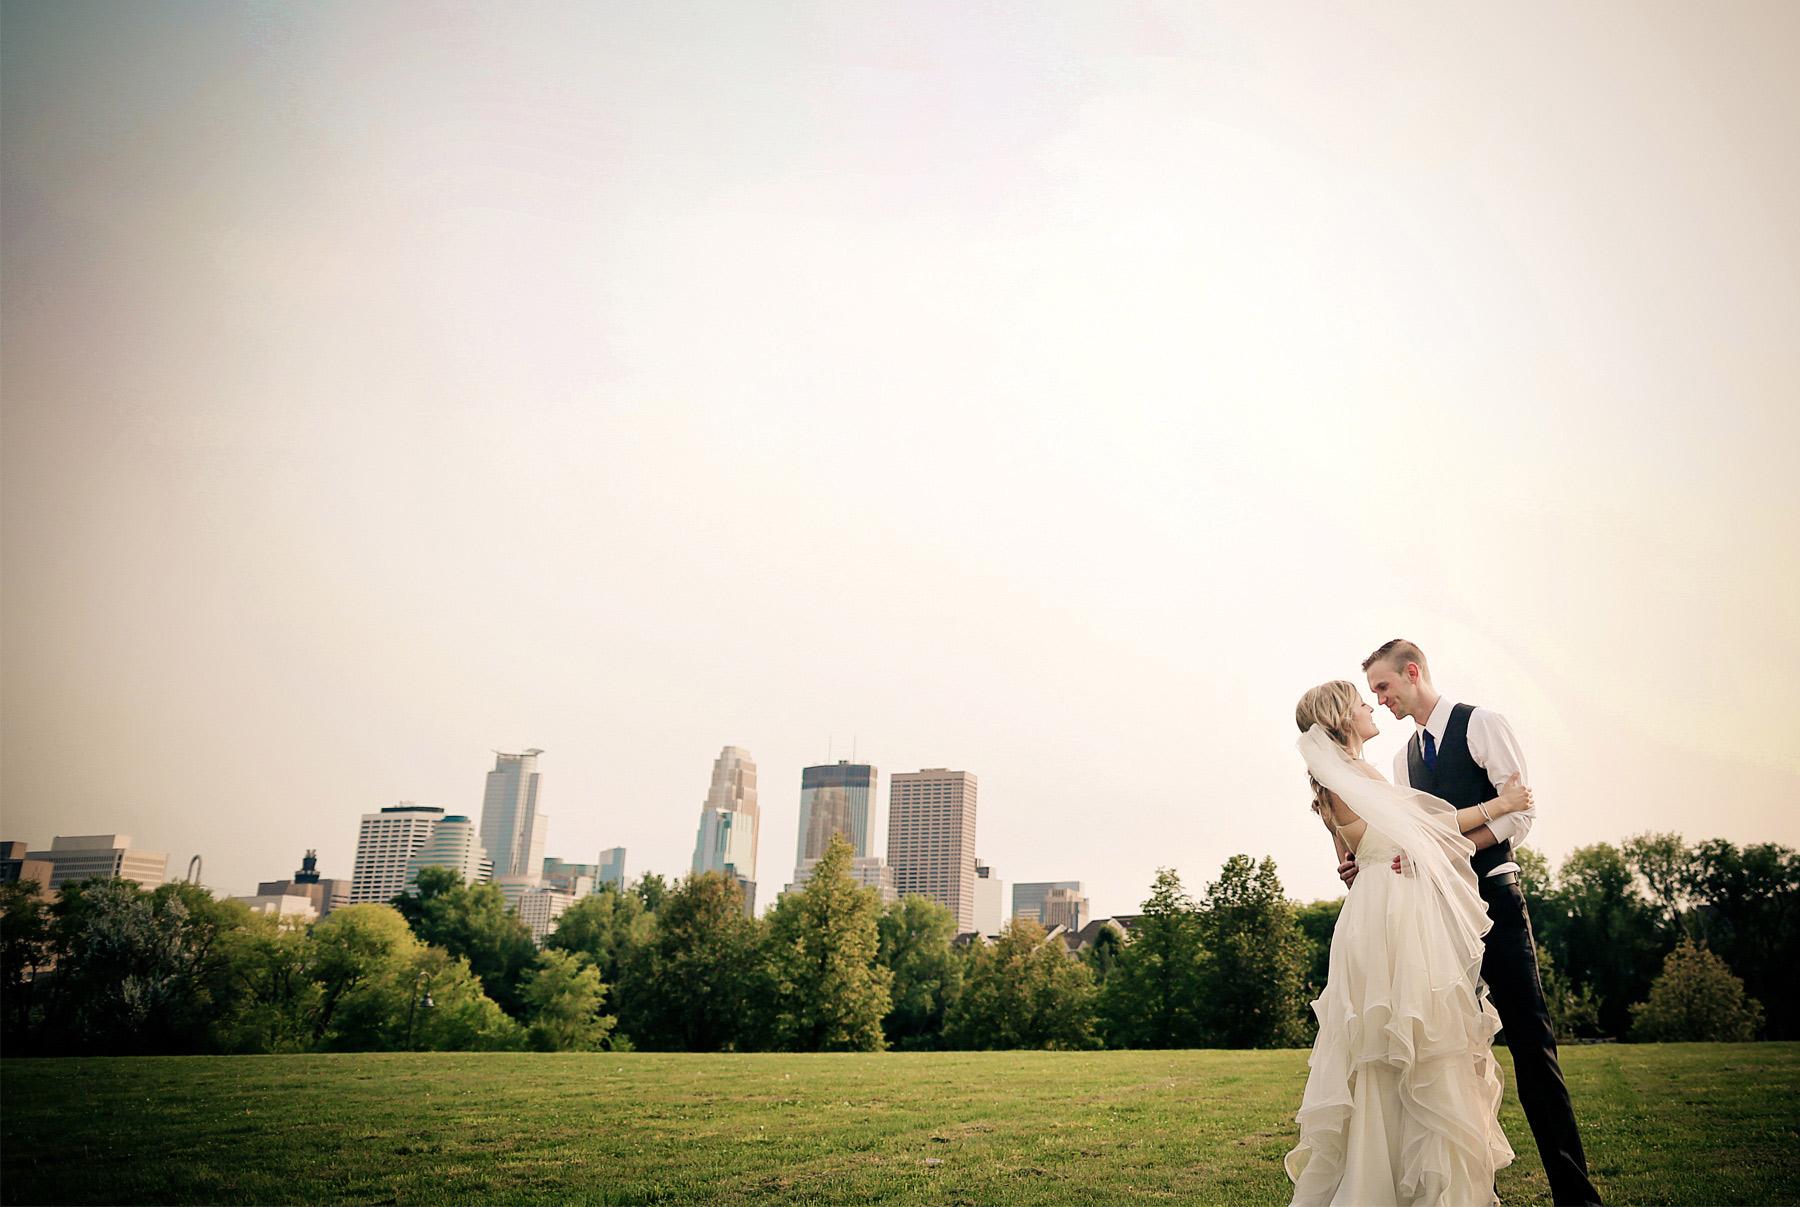 13-Minneapolis-Minnesota-Wedding-Photography-by-Vick-Photography--Skyline-Jess-&-Jake.jpg